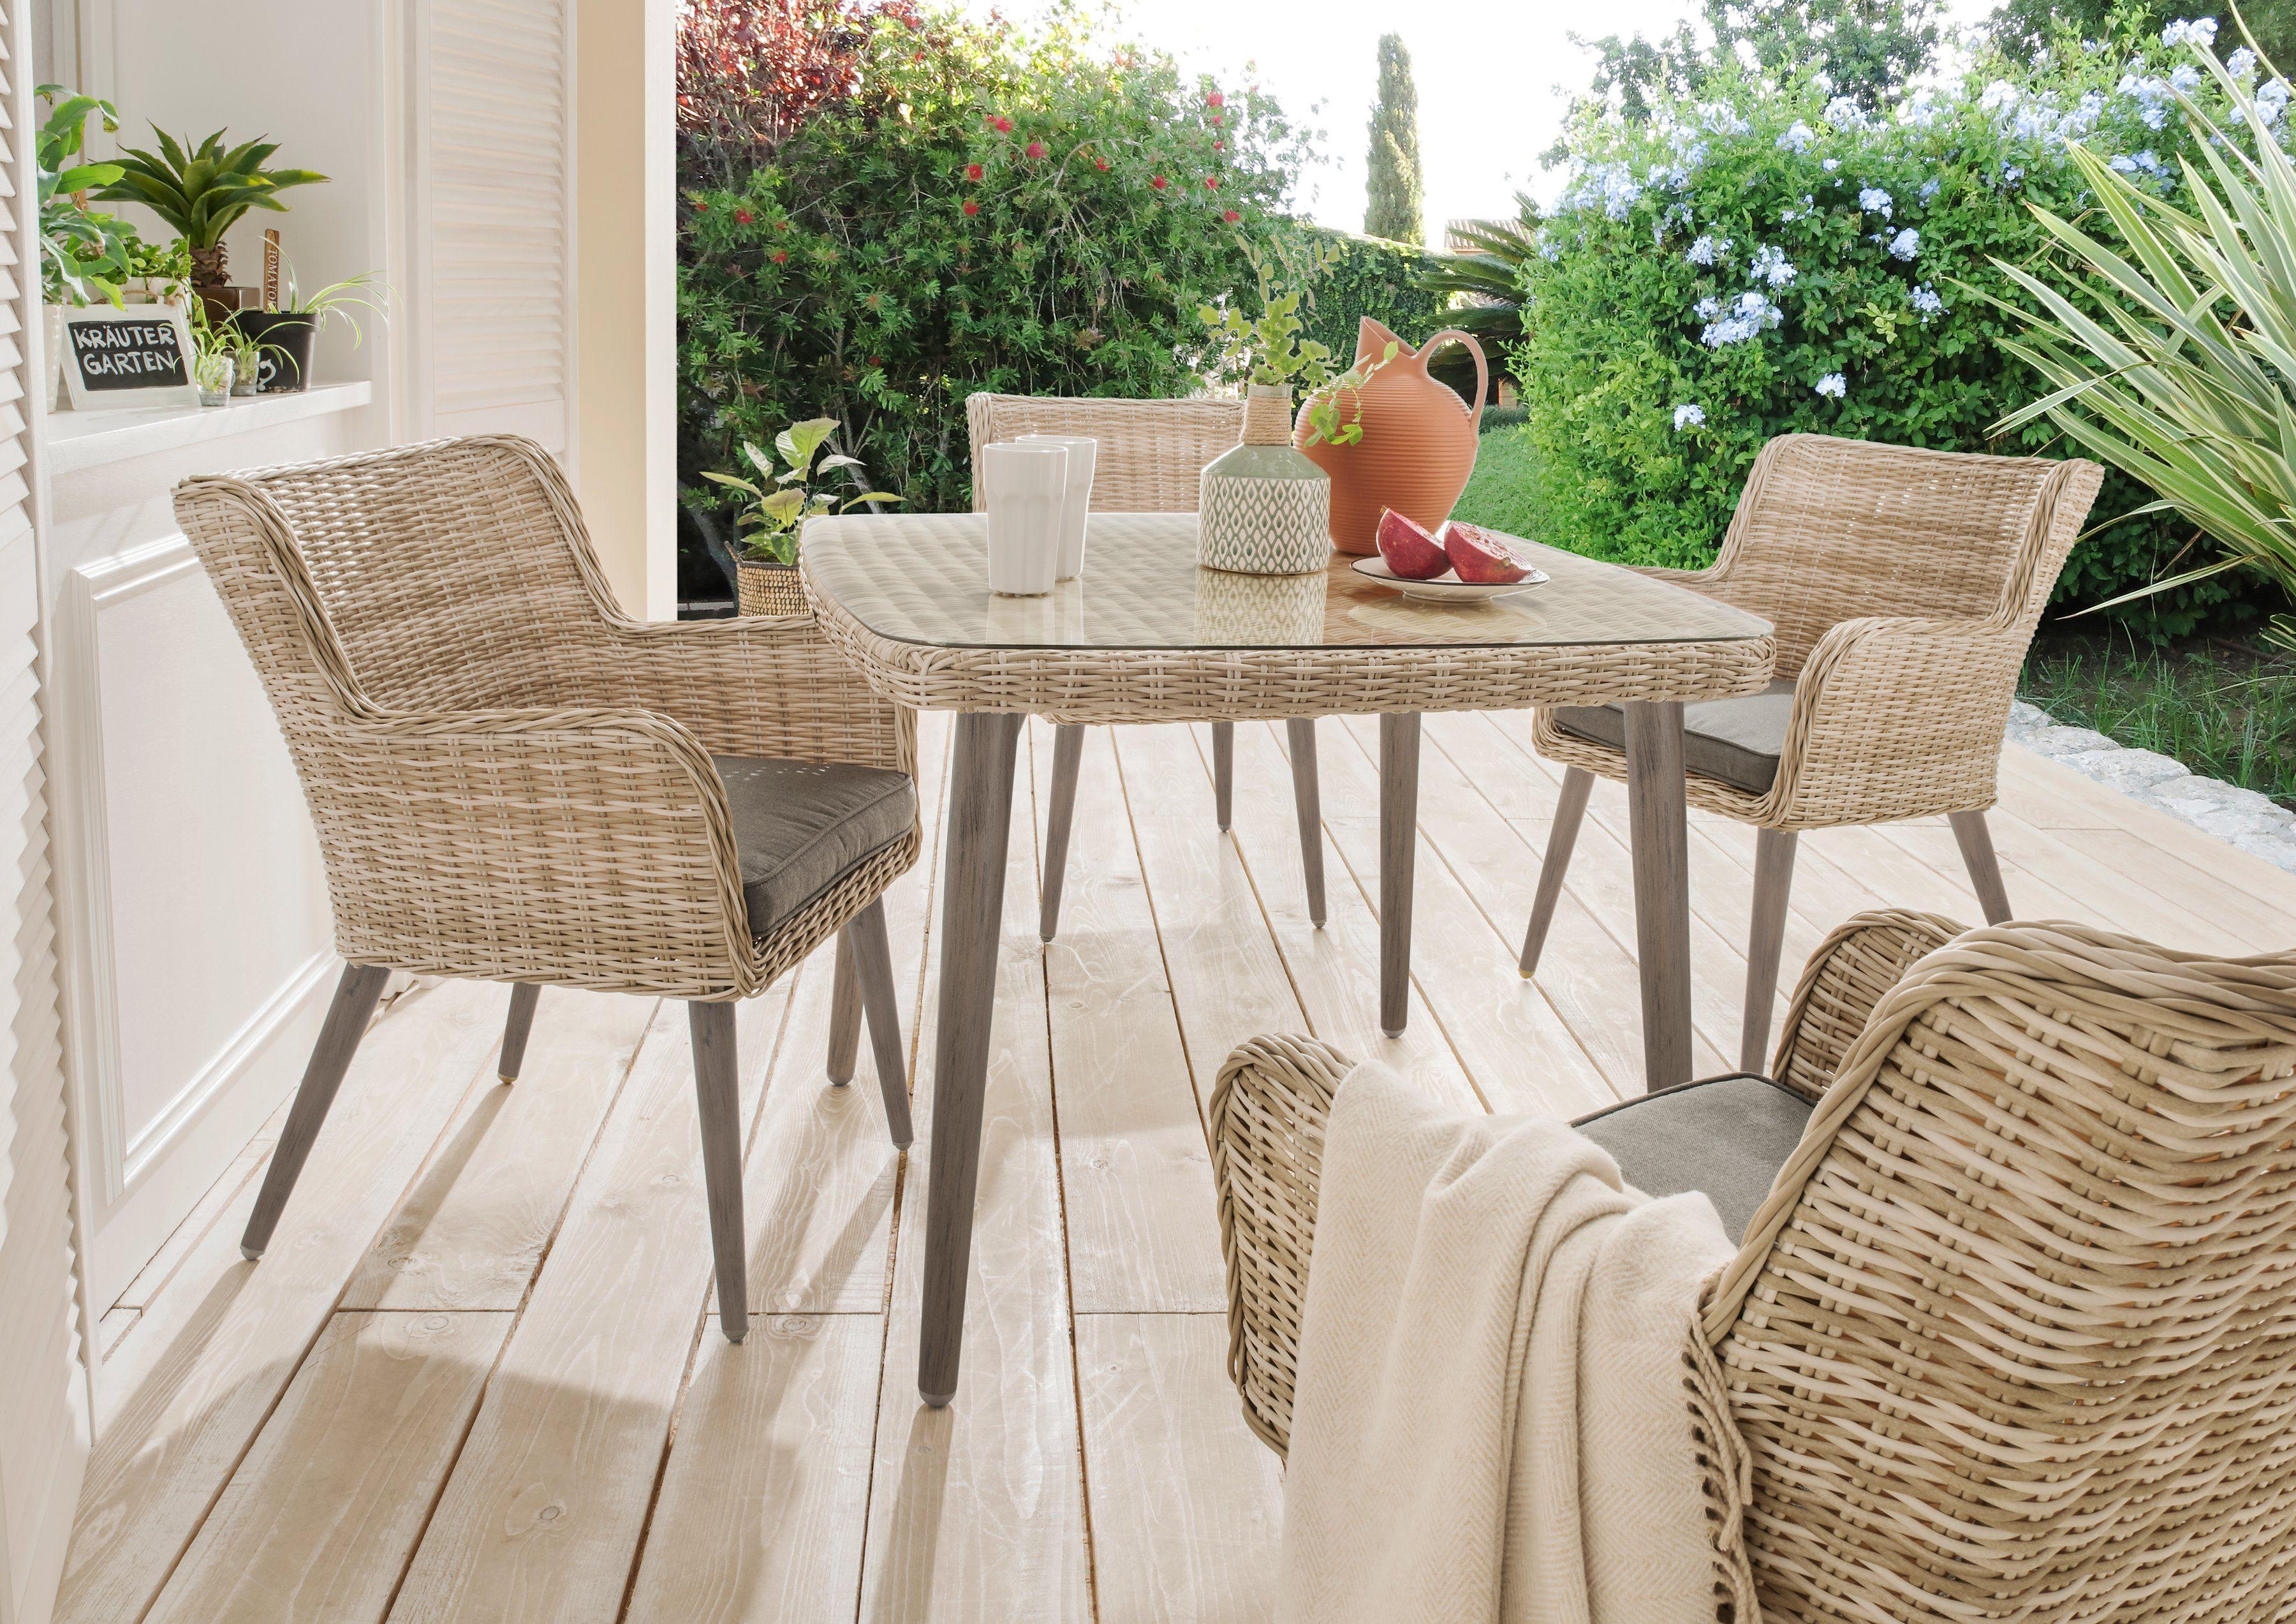 DESTINY Gartenmöbelset »Correda«, 9-tlg., 4 Sessel, Tisch 100x100 cm, Alu/Polyrattan, beige